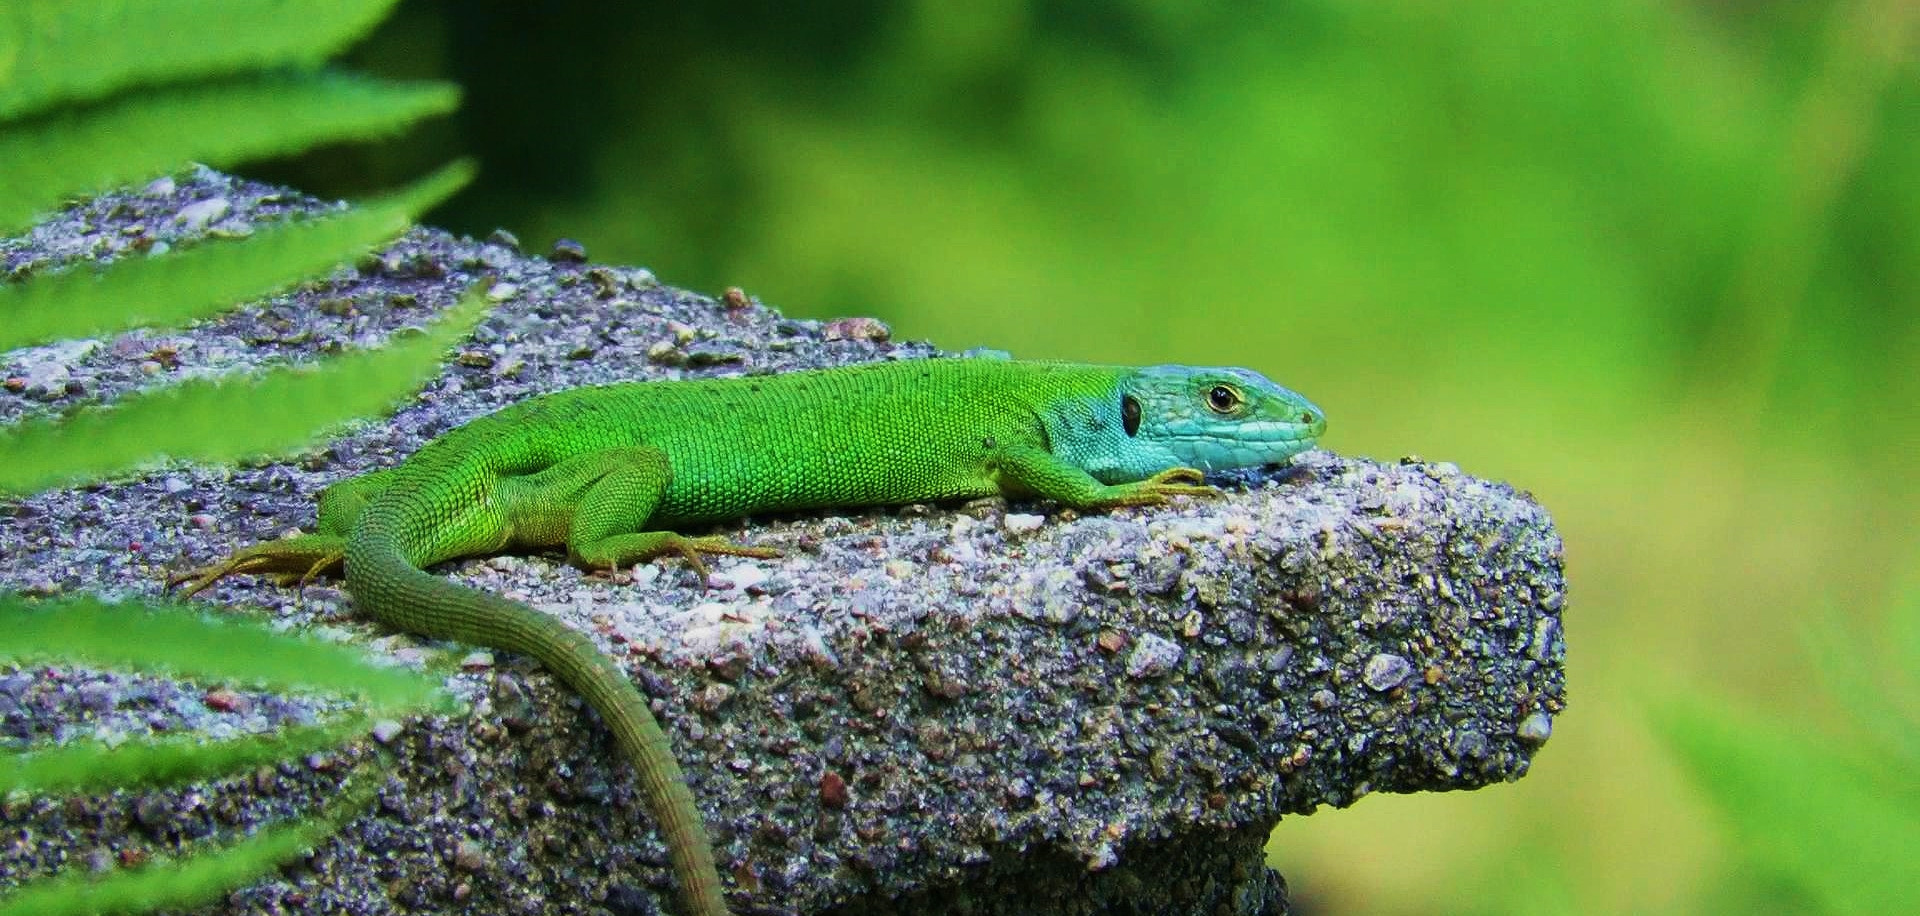 Western green lizard (lacerta bilineata), adult female, Malcantone, Ticino, June 2016.jpg